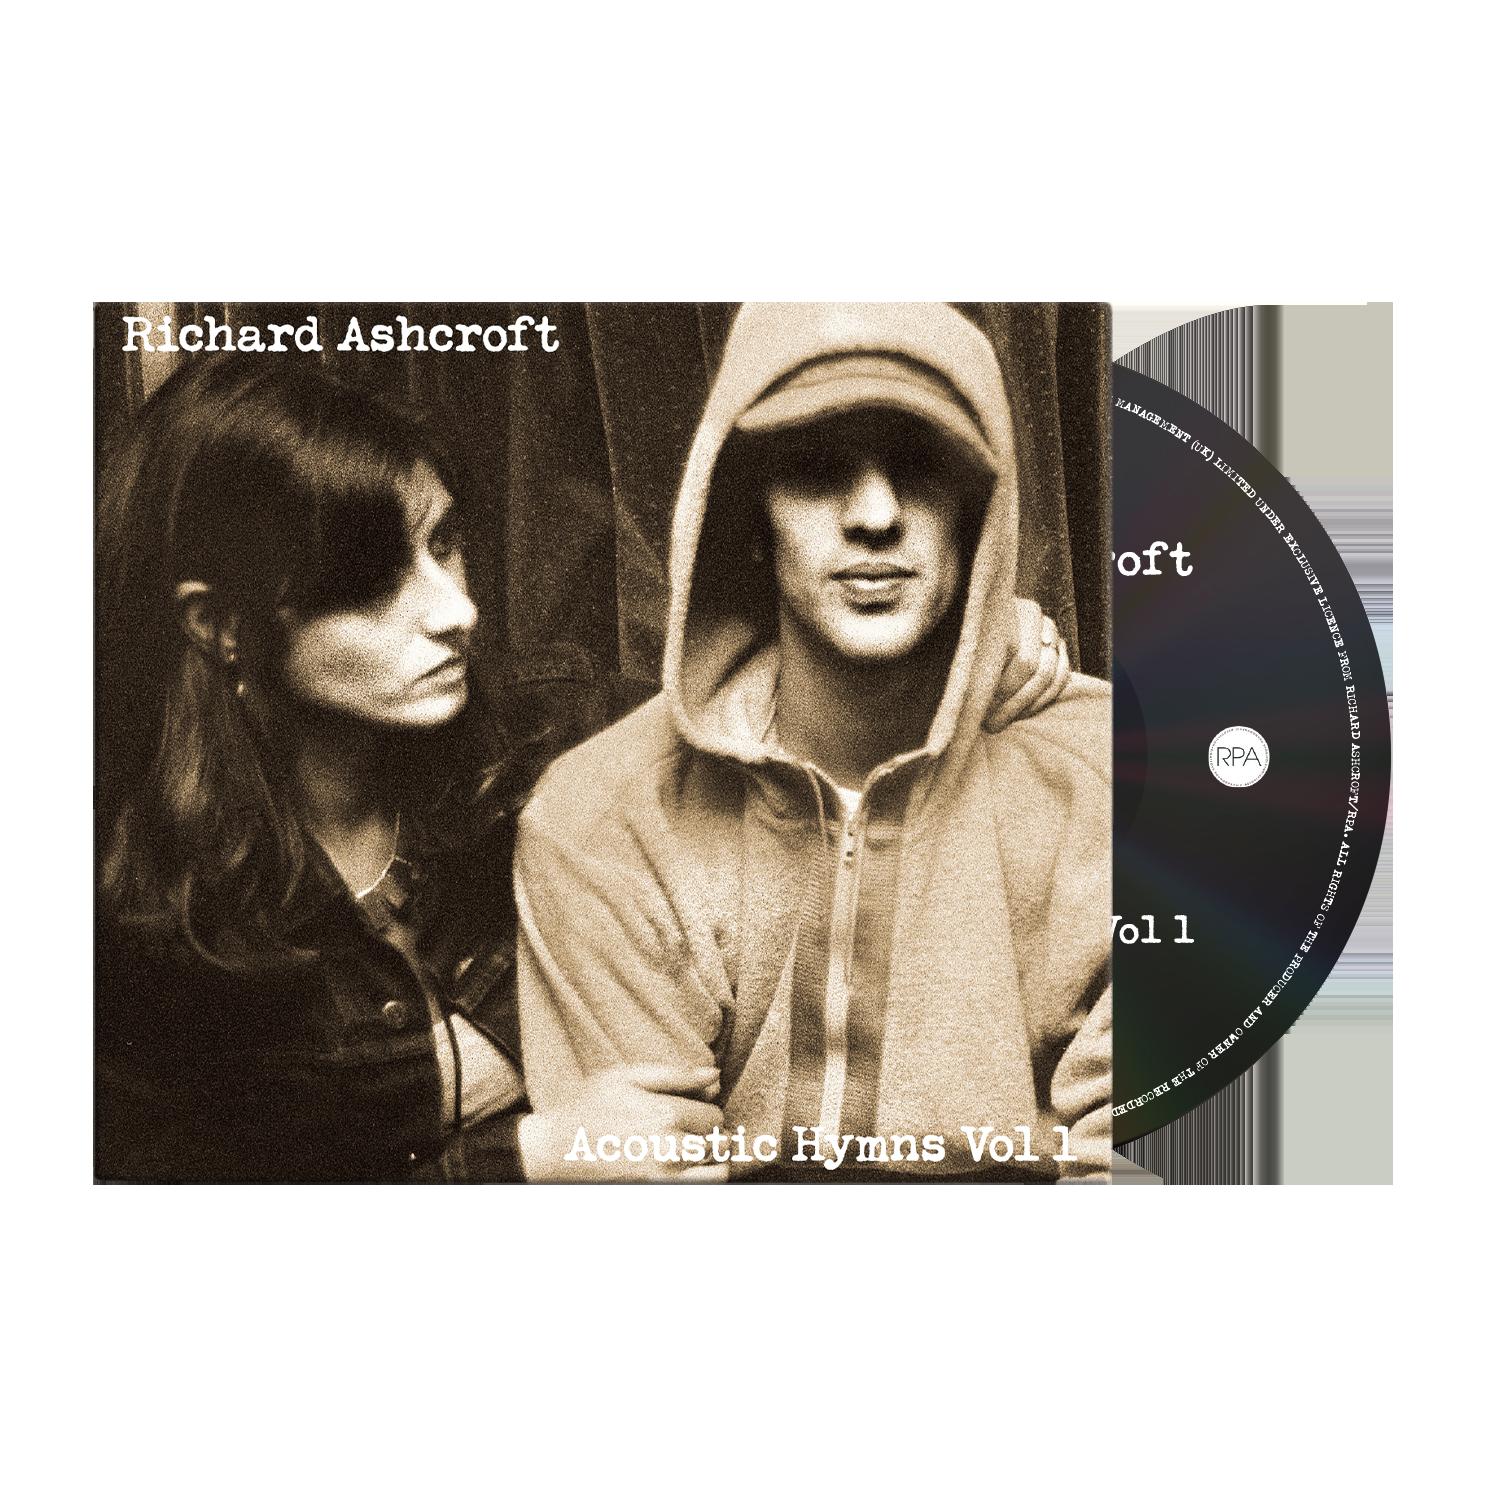 Buy Online Richard Ashcroft - Acoustic Hymns Vol. 1 CD Album